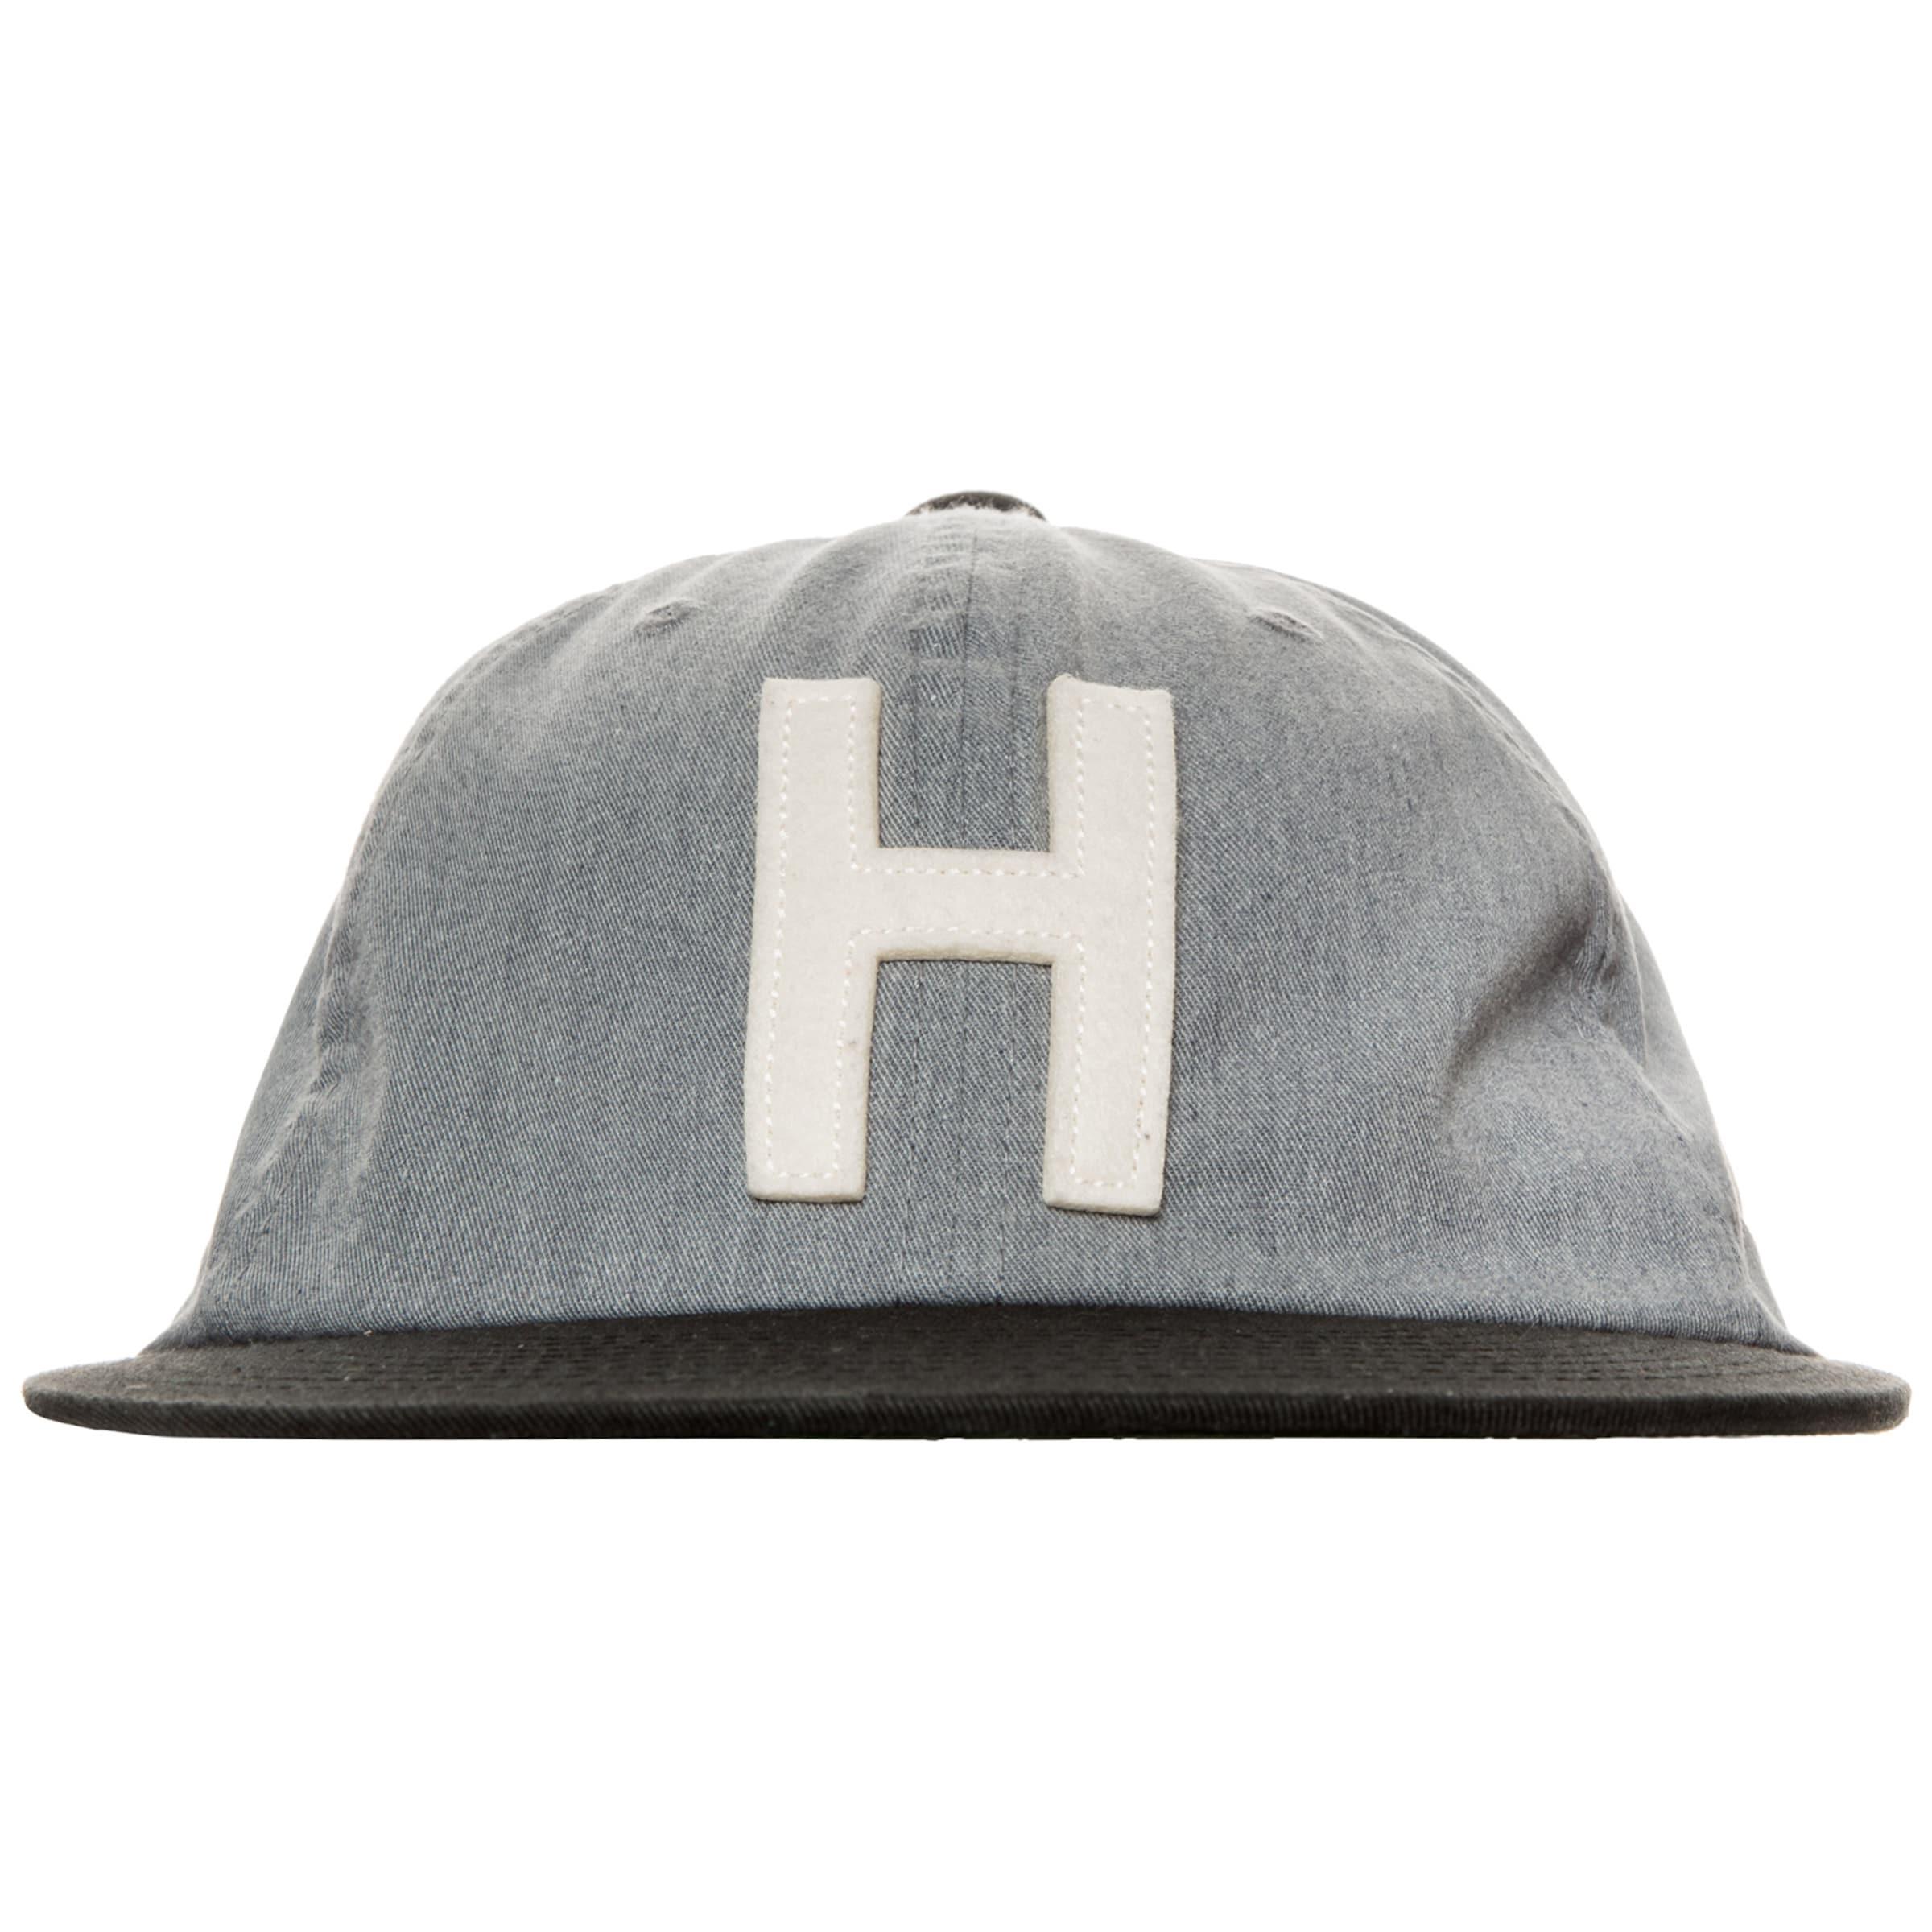 Blanc NuitRouge Herschel Strapback' Casquette Bleu 'harwood En shdxBtQCor